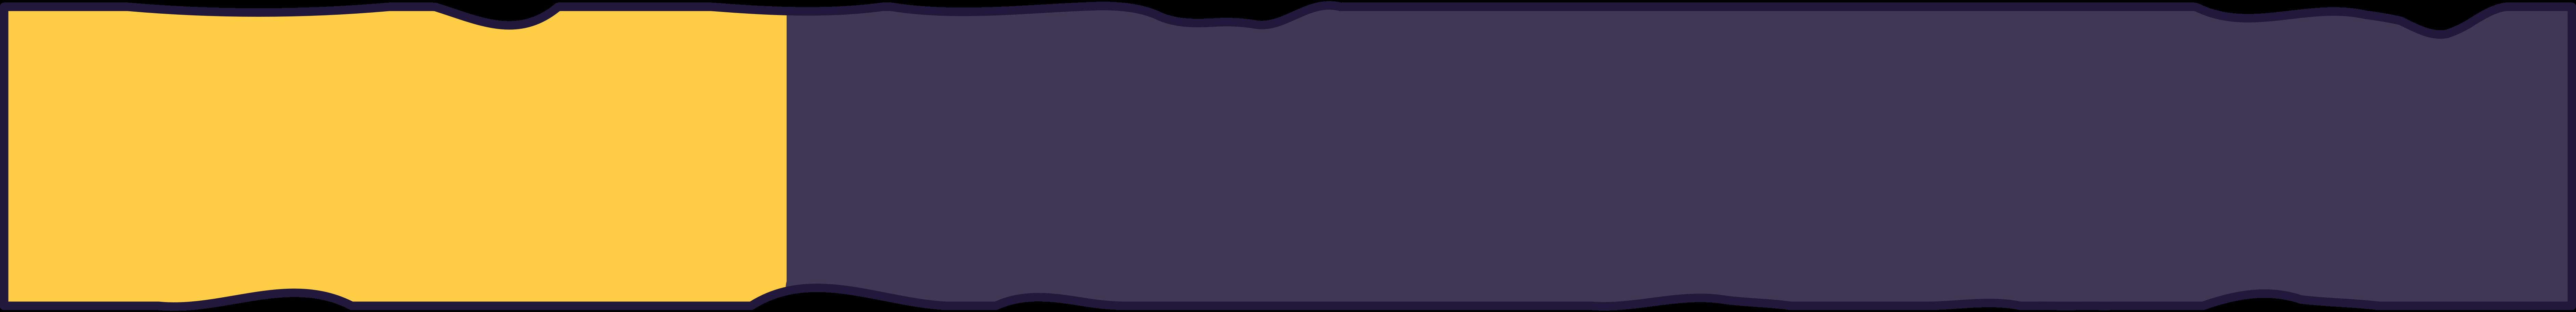 Fortschrittsanzeige Clipart-Grafik als PNG, SVG